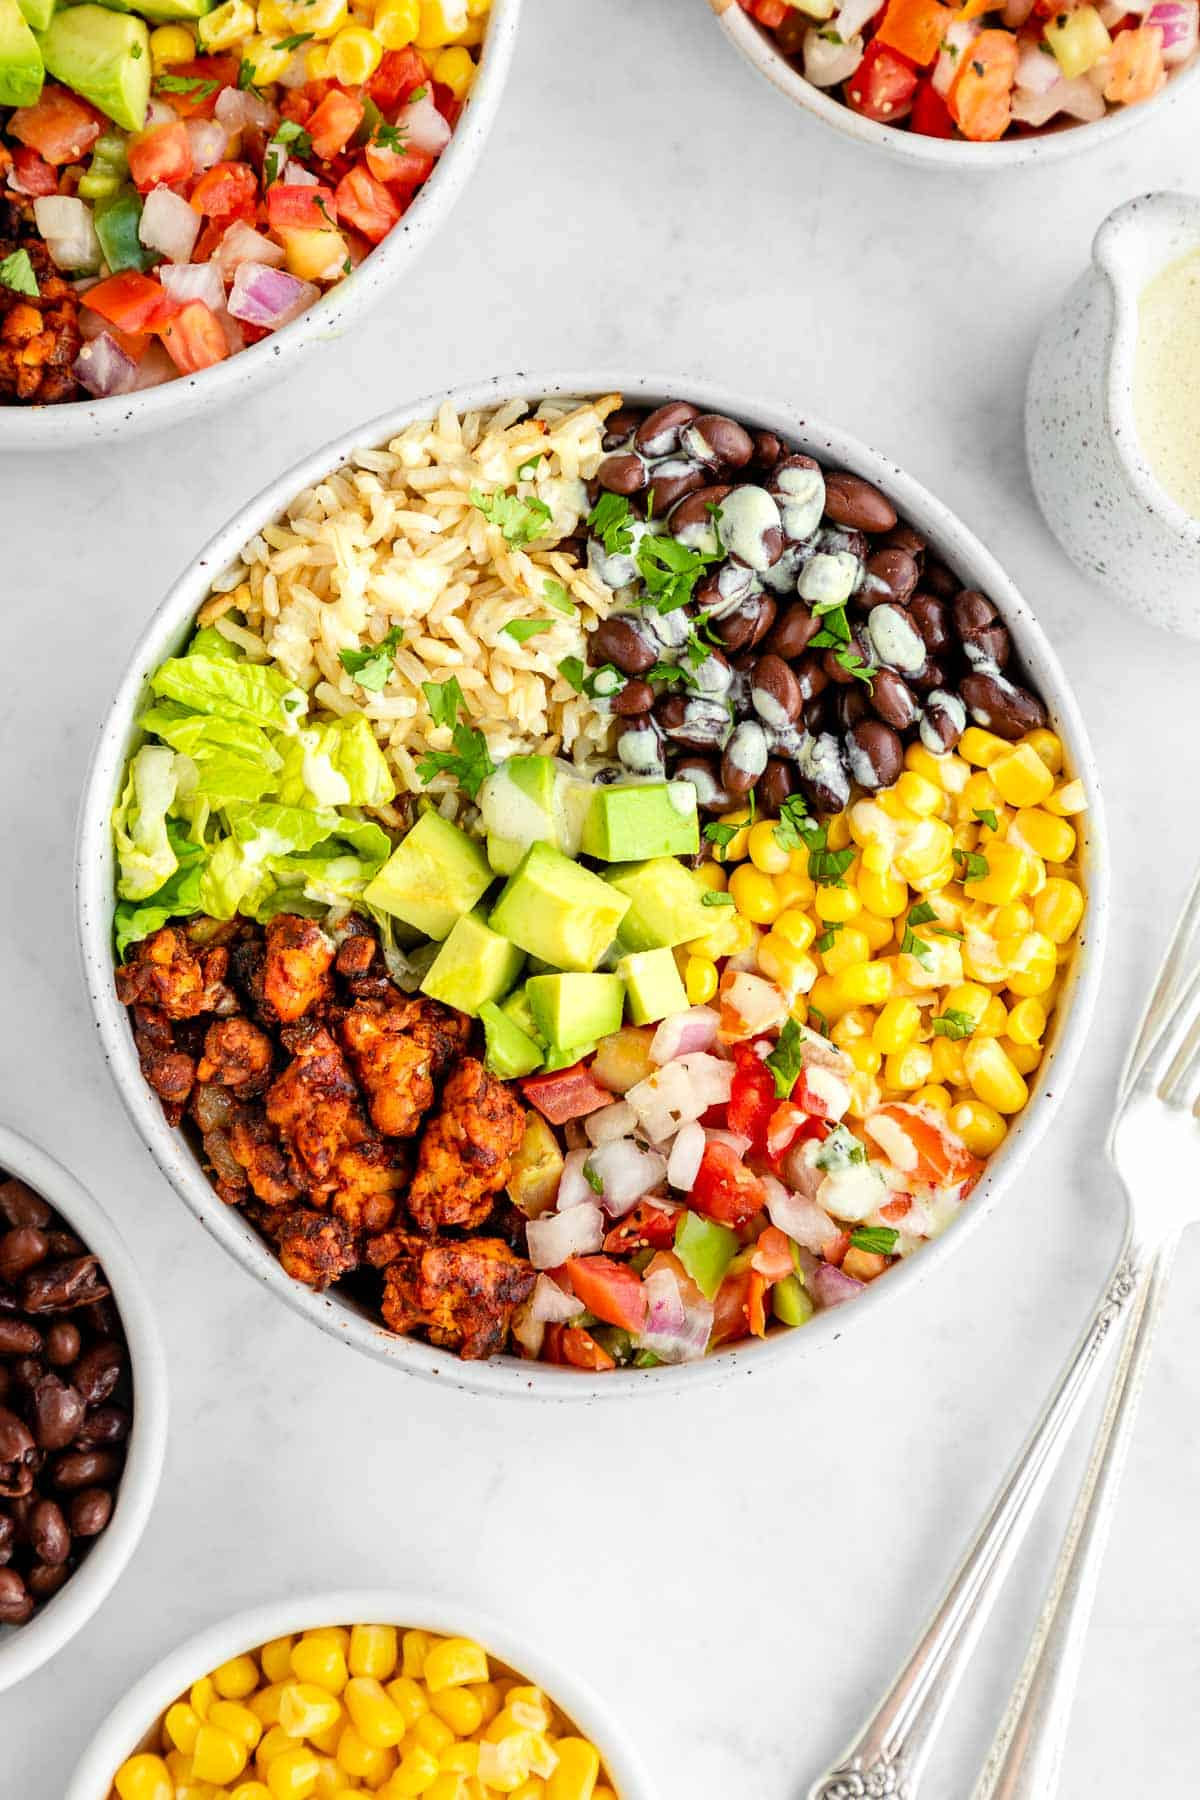 a vegan tempeh burrito bowl with black beans, corn, avocado, lettuce, and pico de gallo